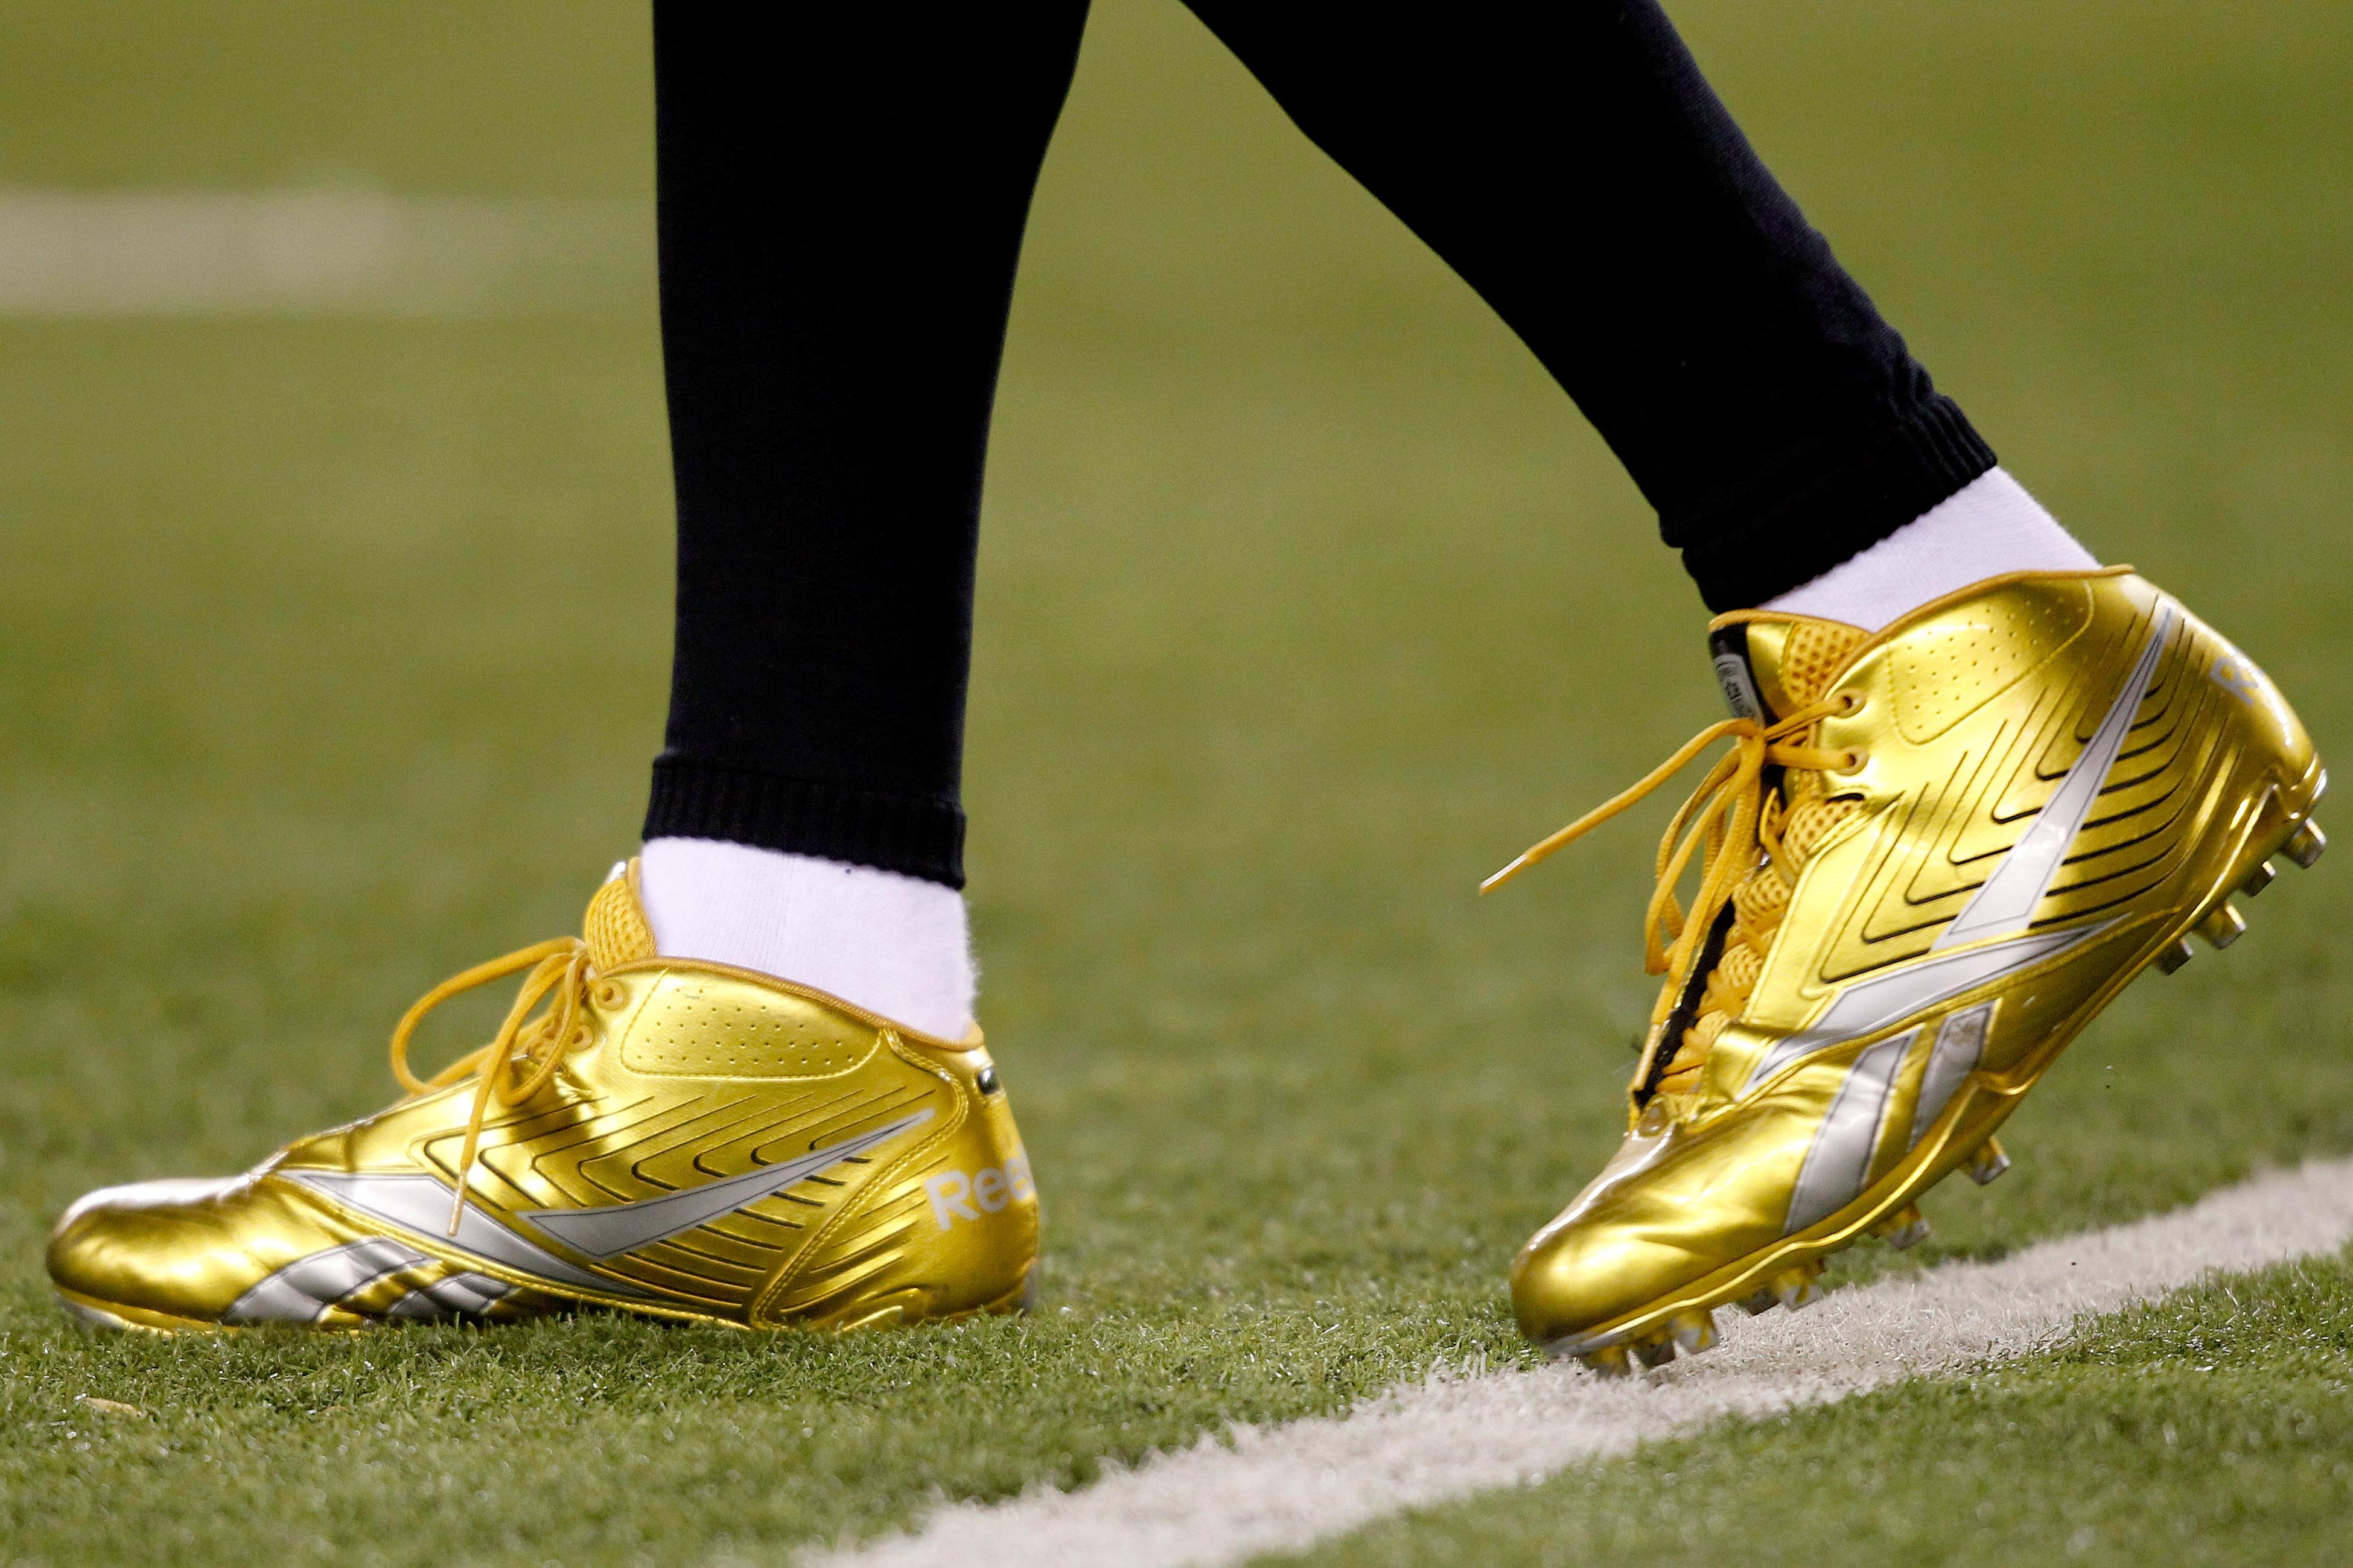 CINCINNATI - NOVEMBER 08:  Shoes worn by Chad Ochocinco #85 of the Cincinnati Bengals against the Pittsburgh Steelers at Paul Brown Stadium on November 8, 2010 in Cincinnati, Ohio.  (Photo by Matthew Stockman/Getty Images)